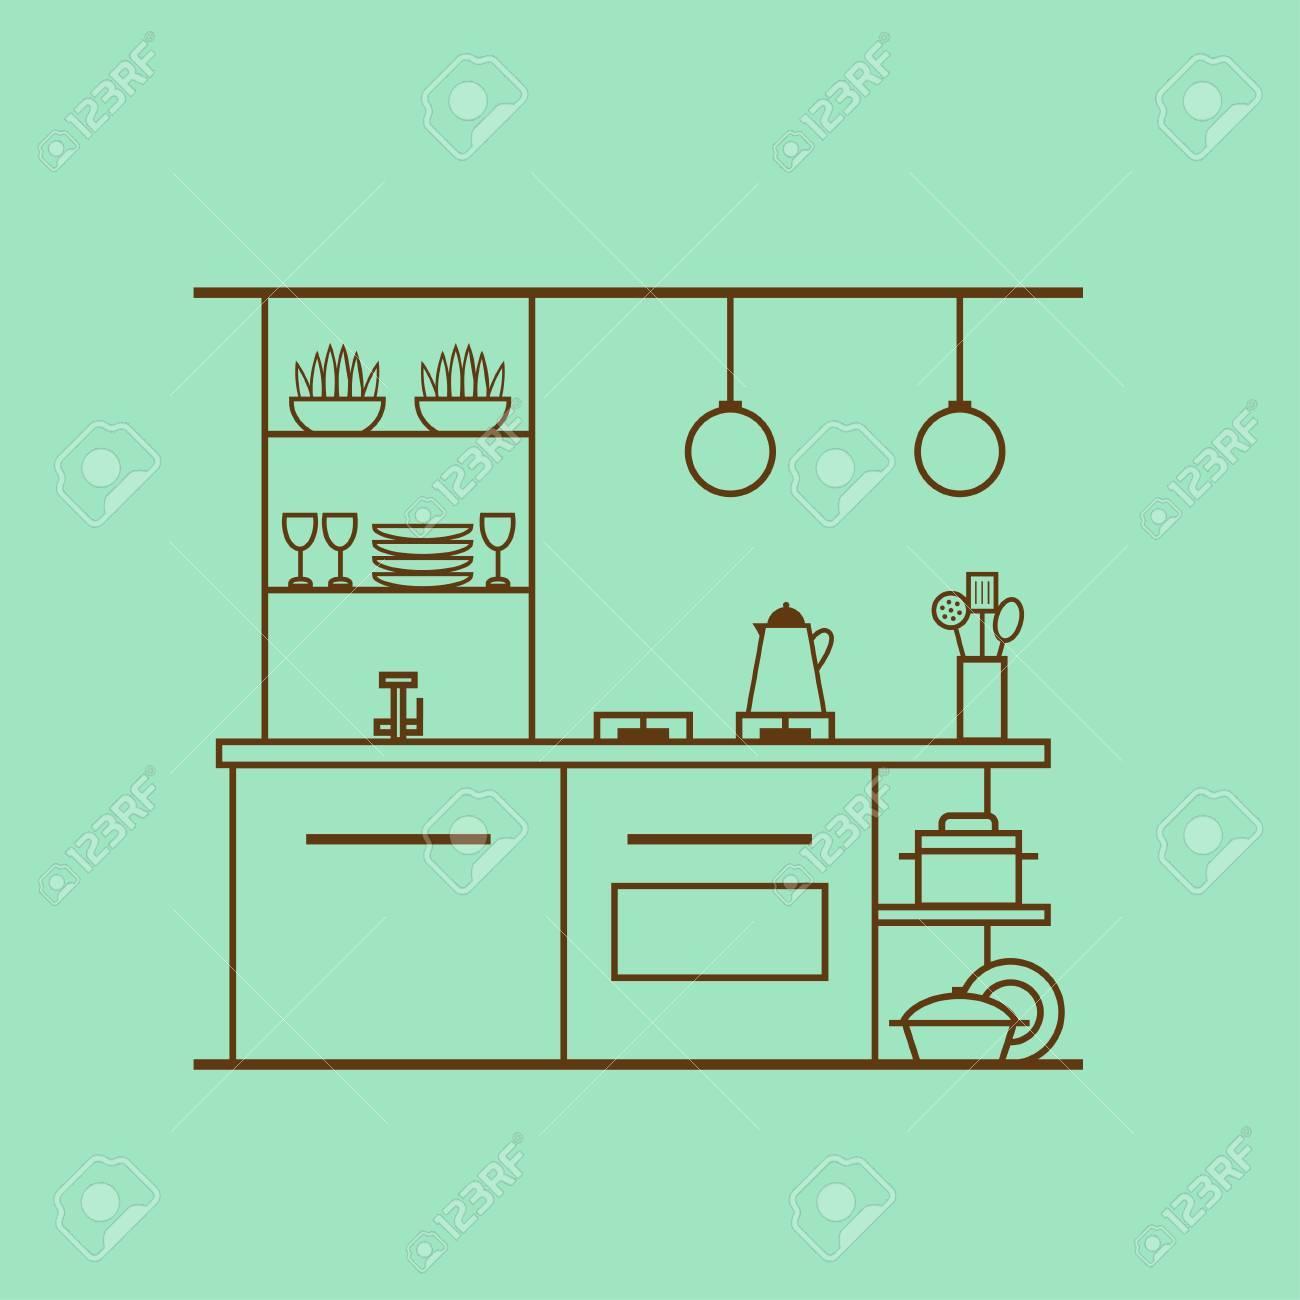 Kitchen Interior Design Made Of Thin Line Concept Of Modern